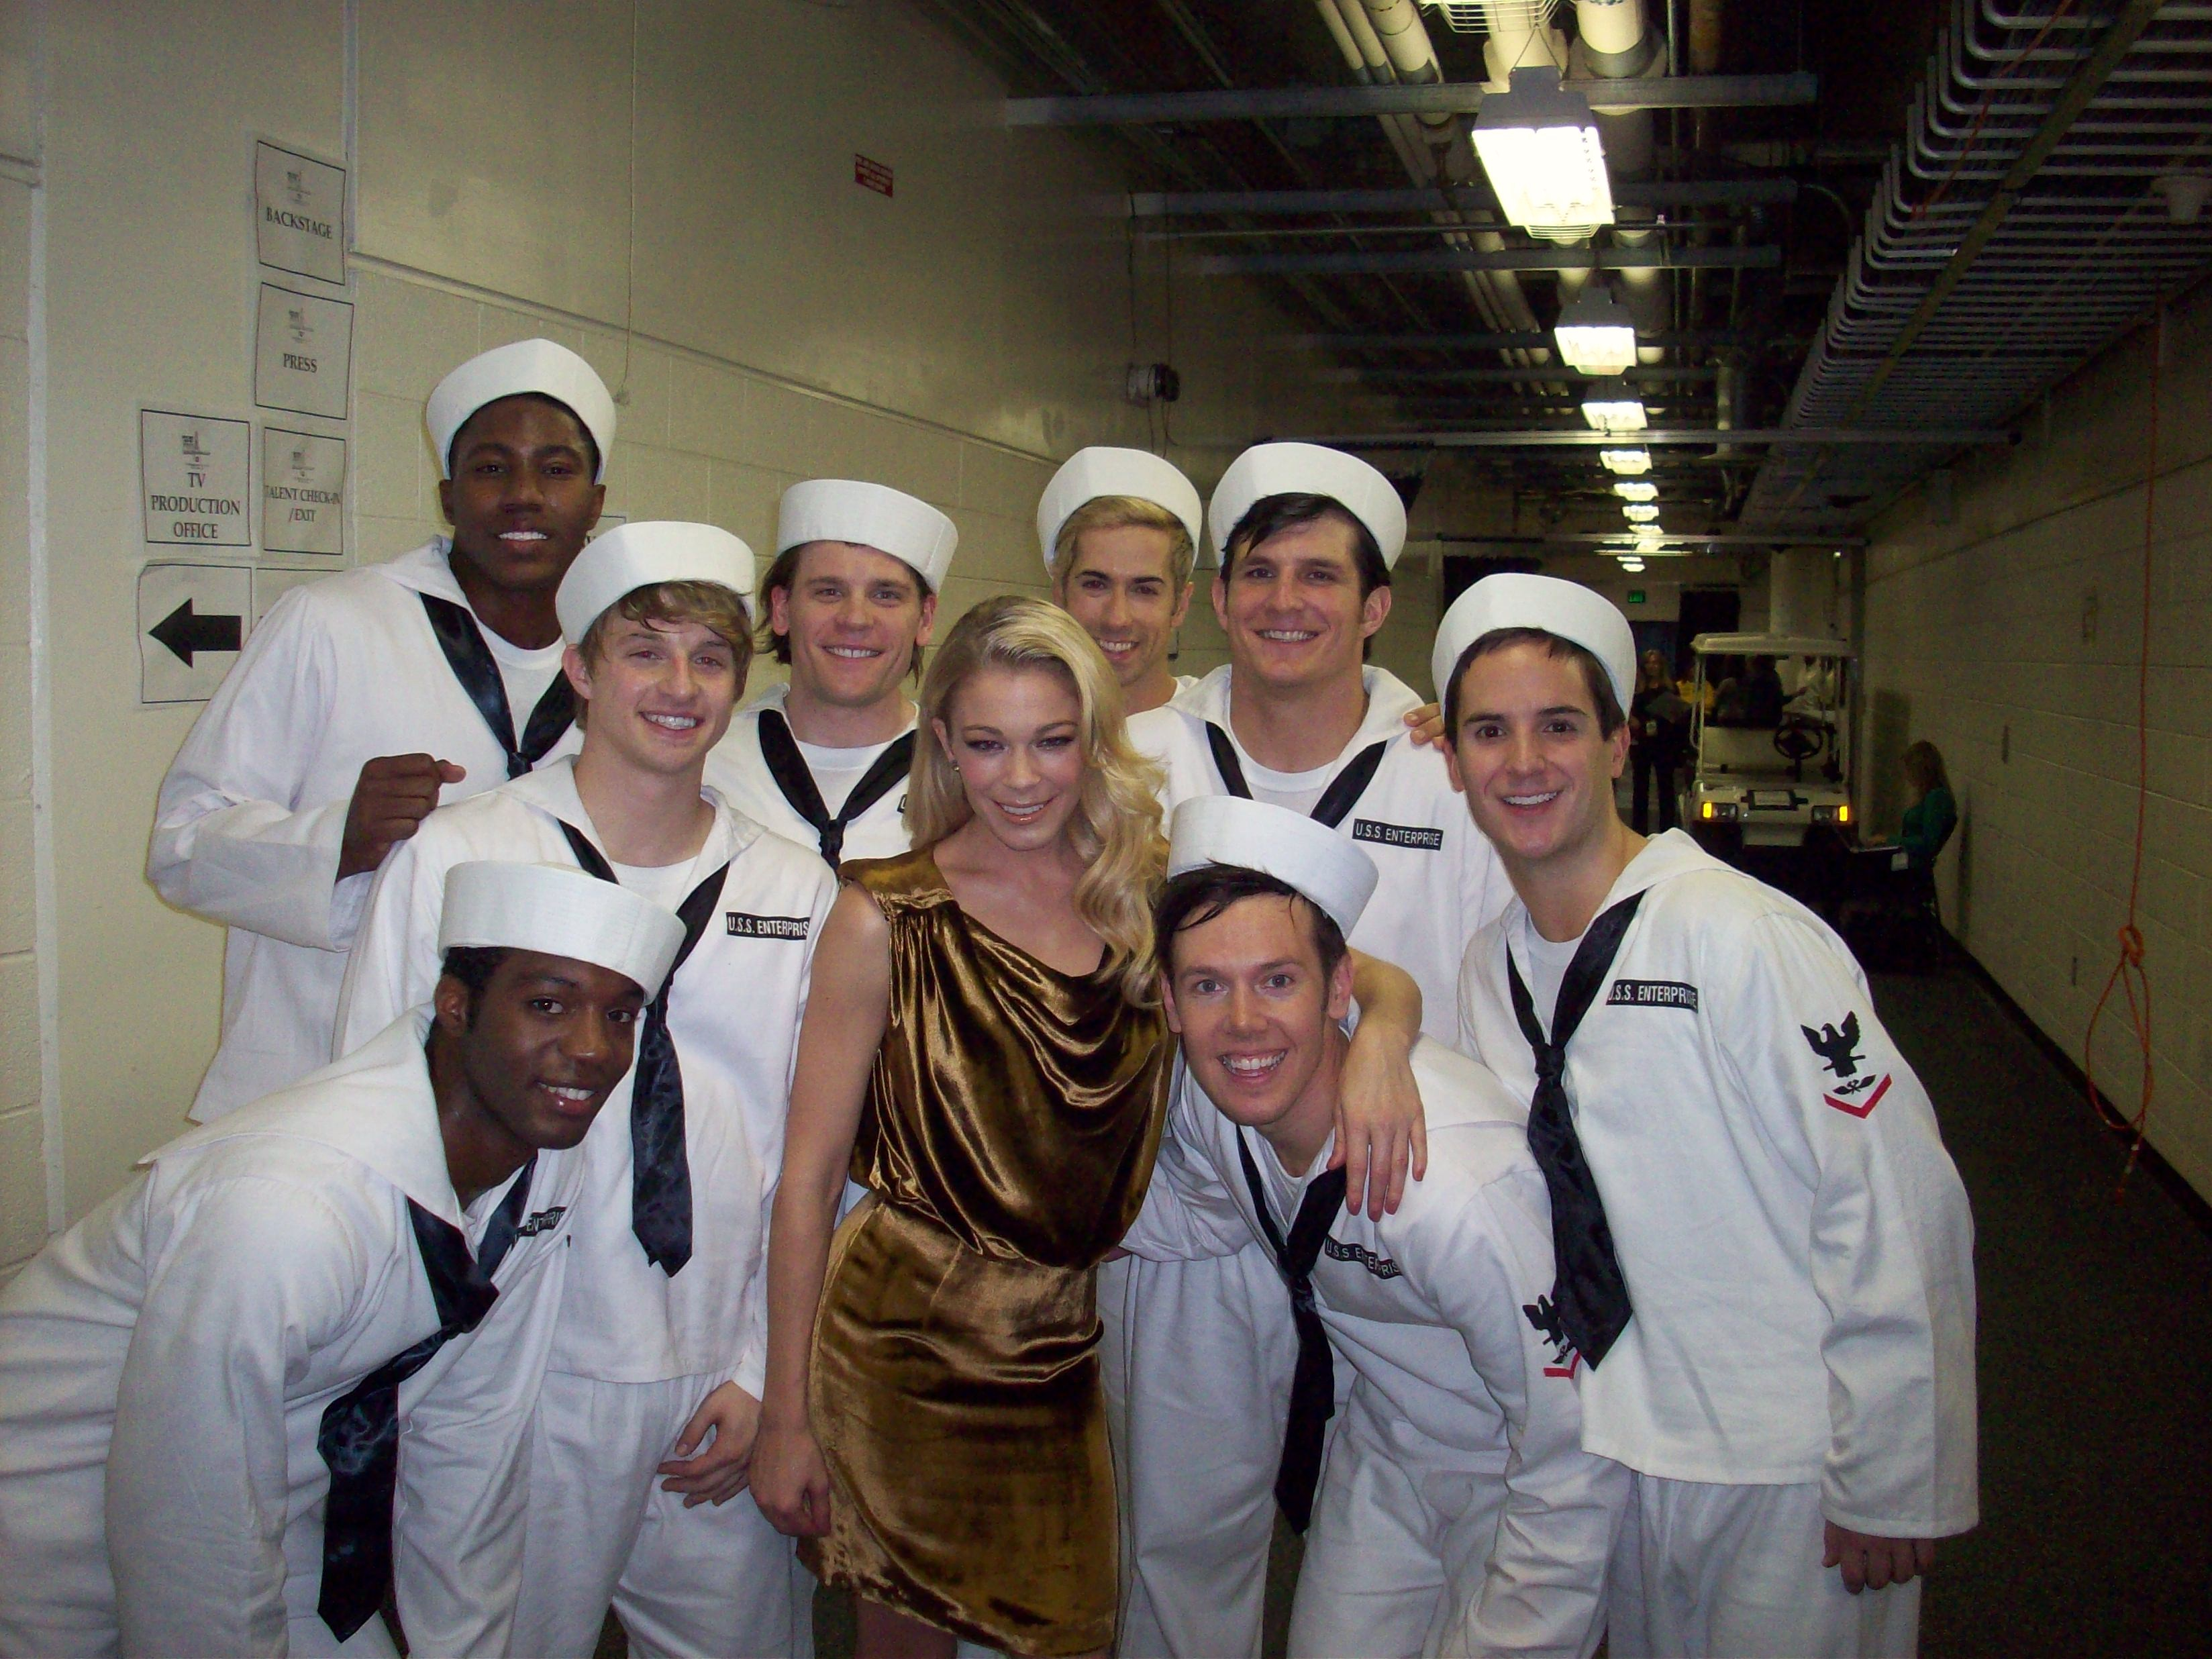 LeAnn Rimes Backstage